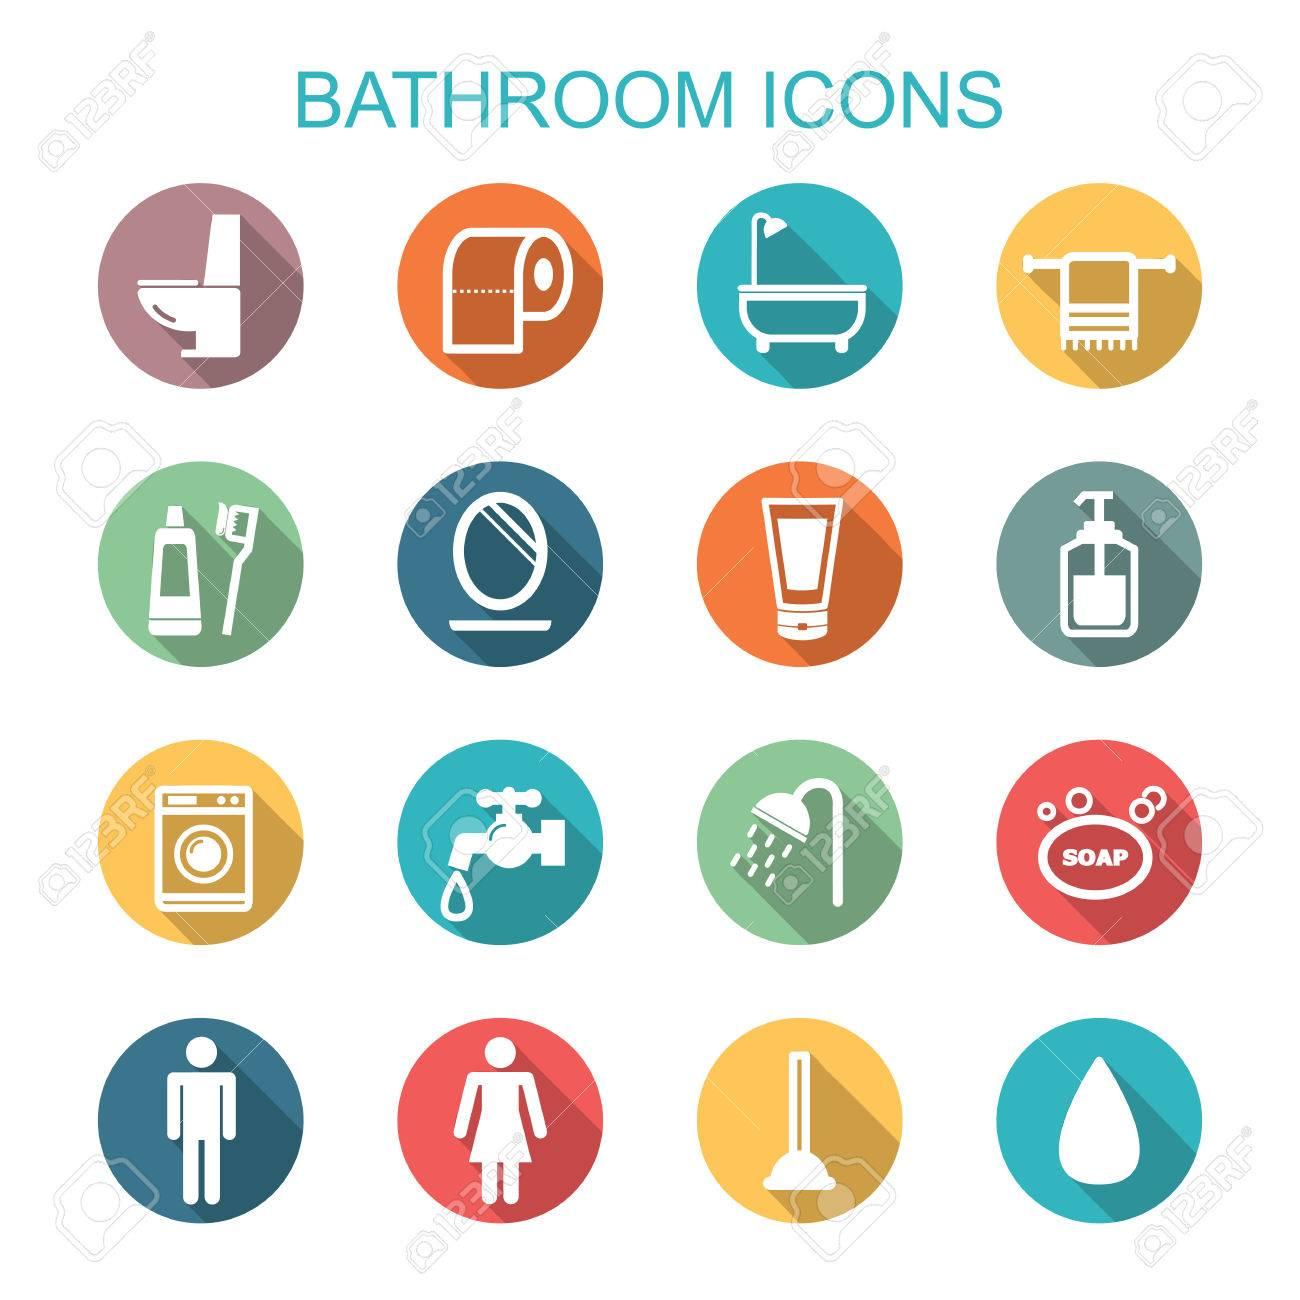 bathroom long shadow icons, flat vector symbols - 33706901